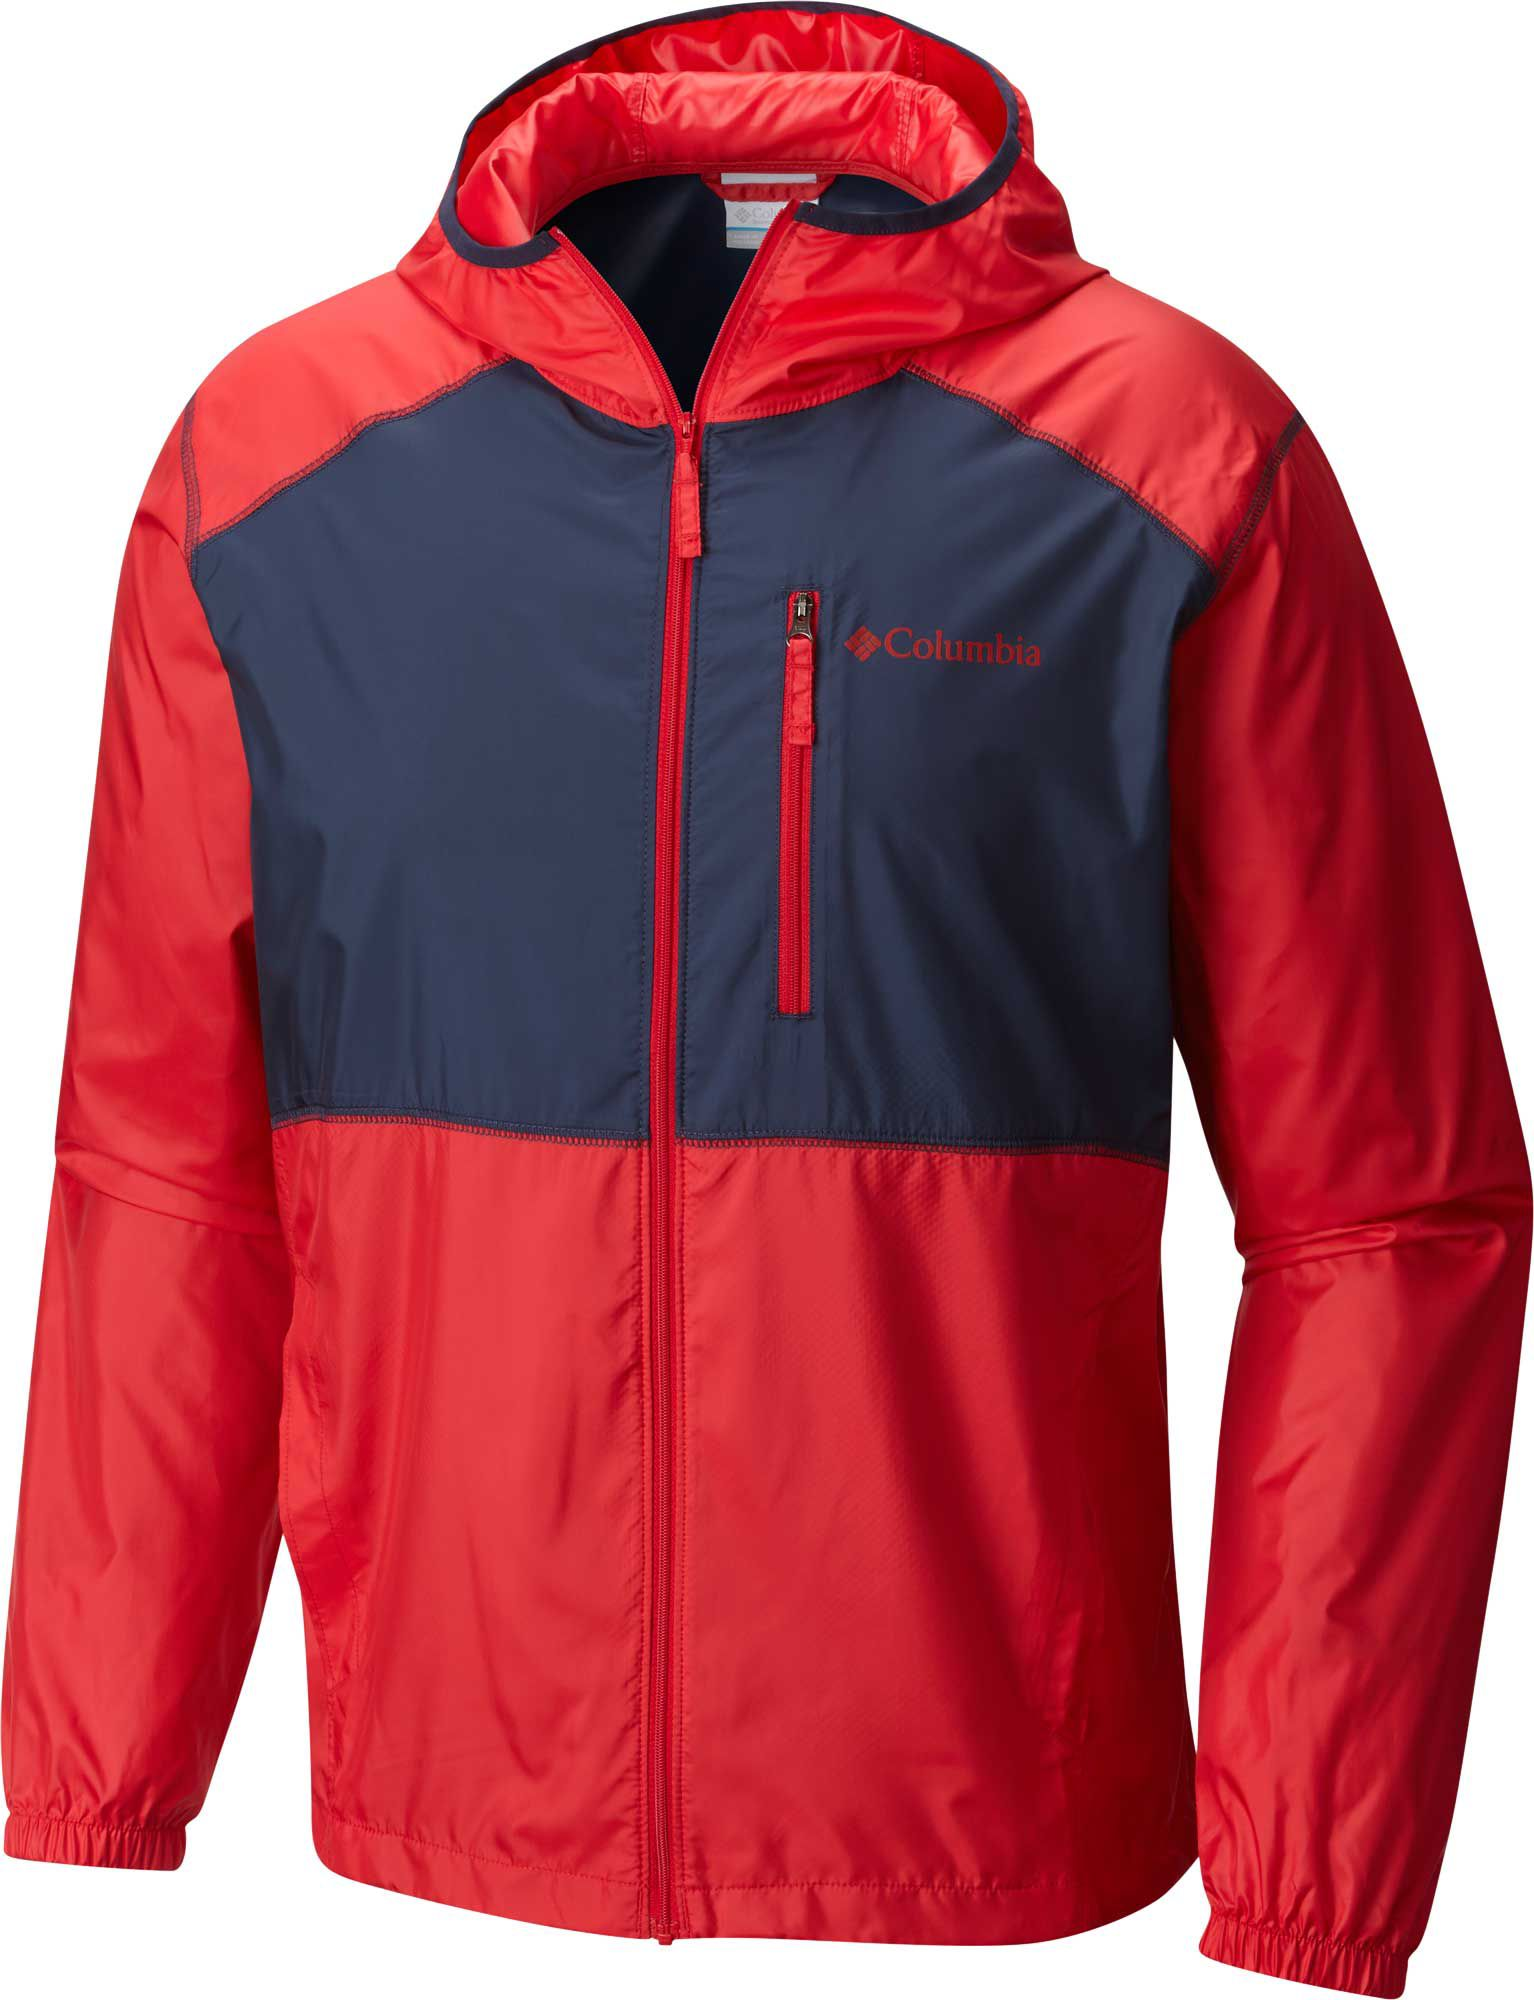 windbreaker jackets noimagefound ??? oqvqofk